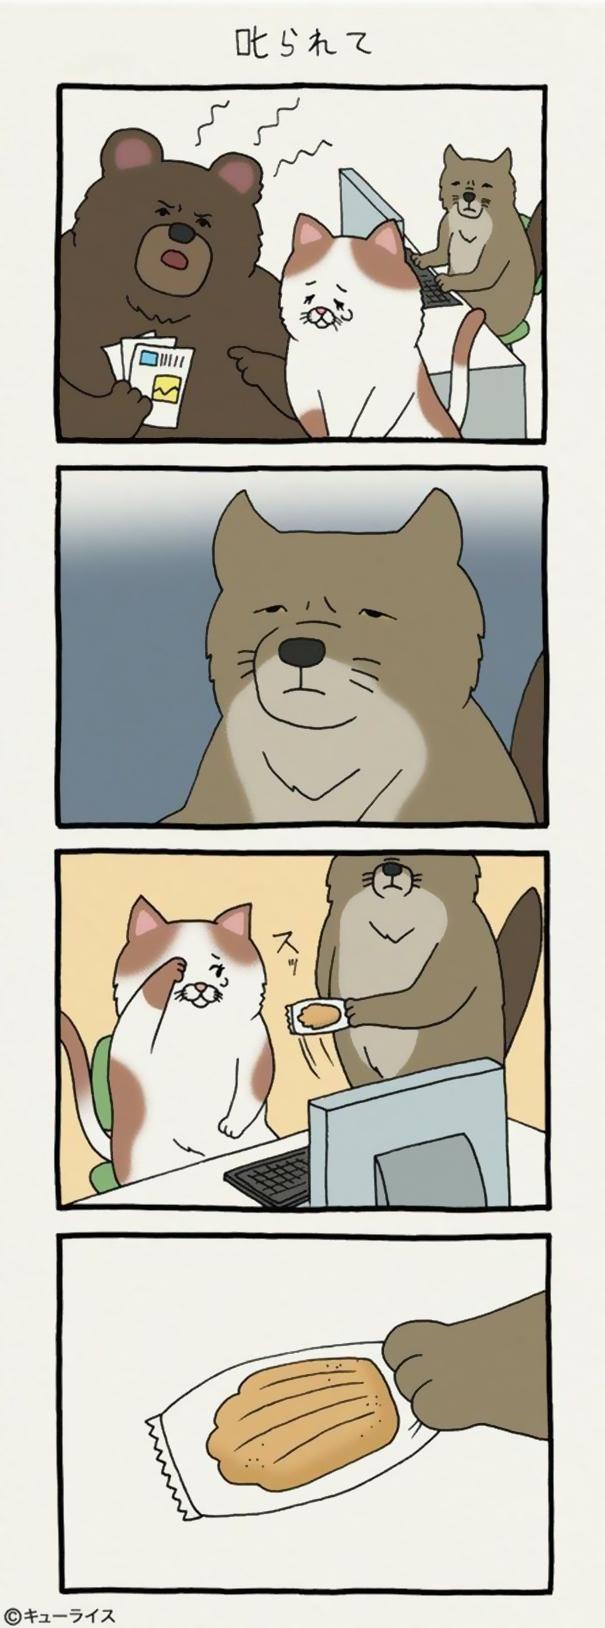 dog cartoon comics qrais japan 11 59895b420d00d  605 - 우울한 당신을 웃게 해줄 '착한 티벳 여우' 4컷 만화